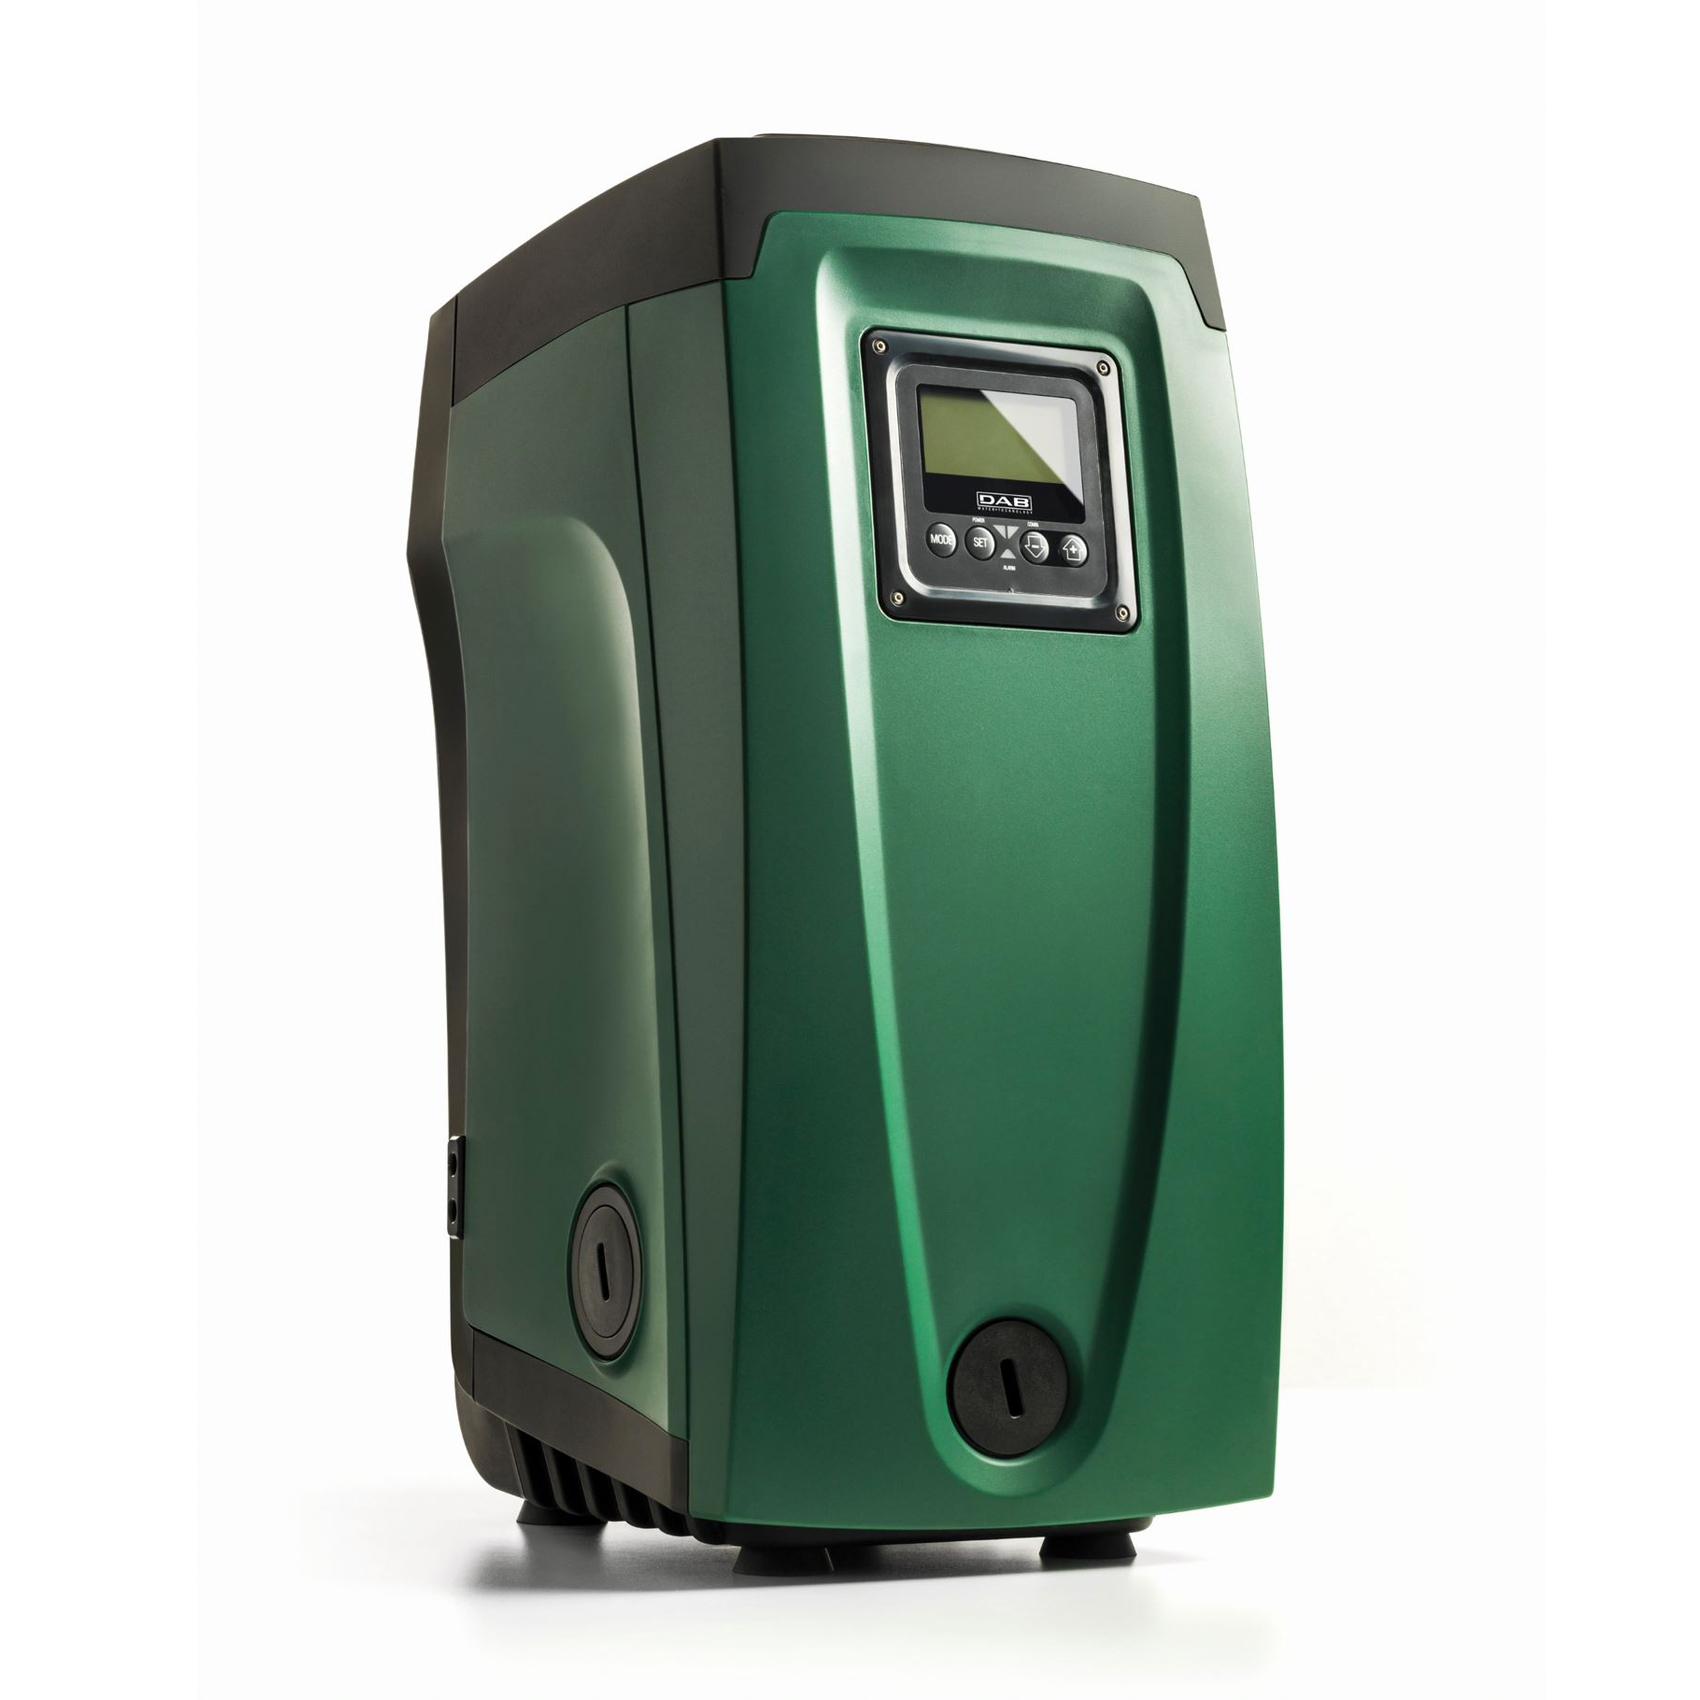 DAB Easybox DIN1988-500